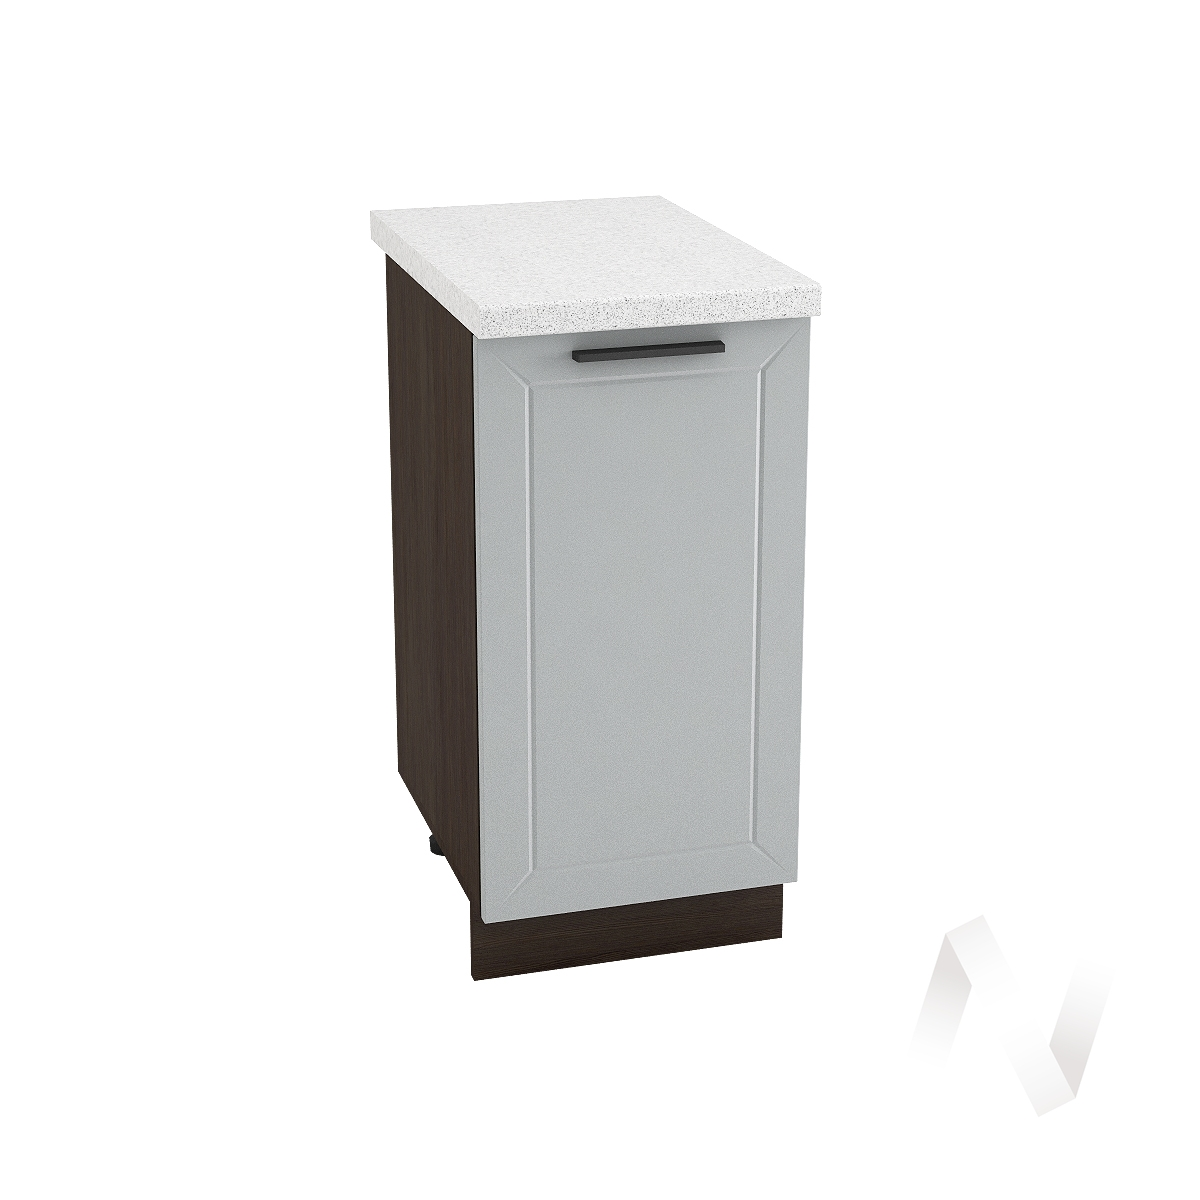 "Кухня ""Глетчер"": Шкаф нижний 400, ШН 400 (Гейнсборо Силк/корпус венге)"